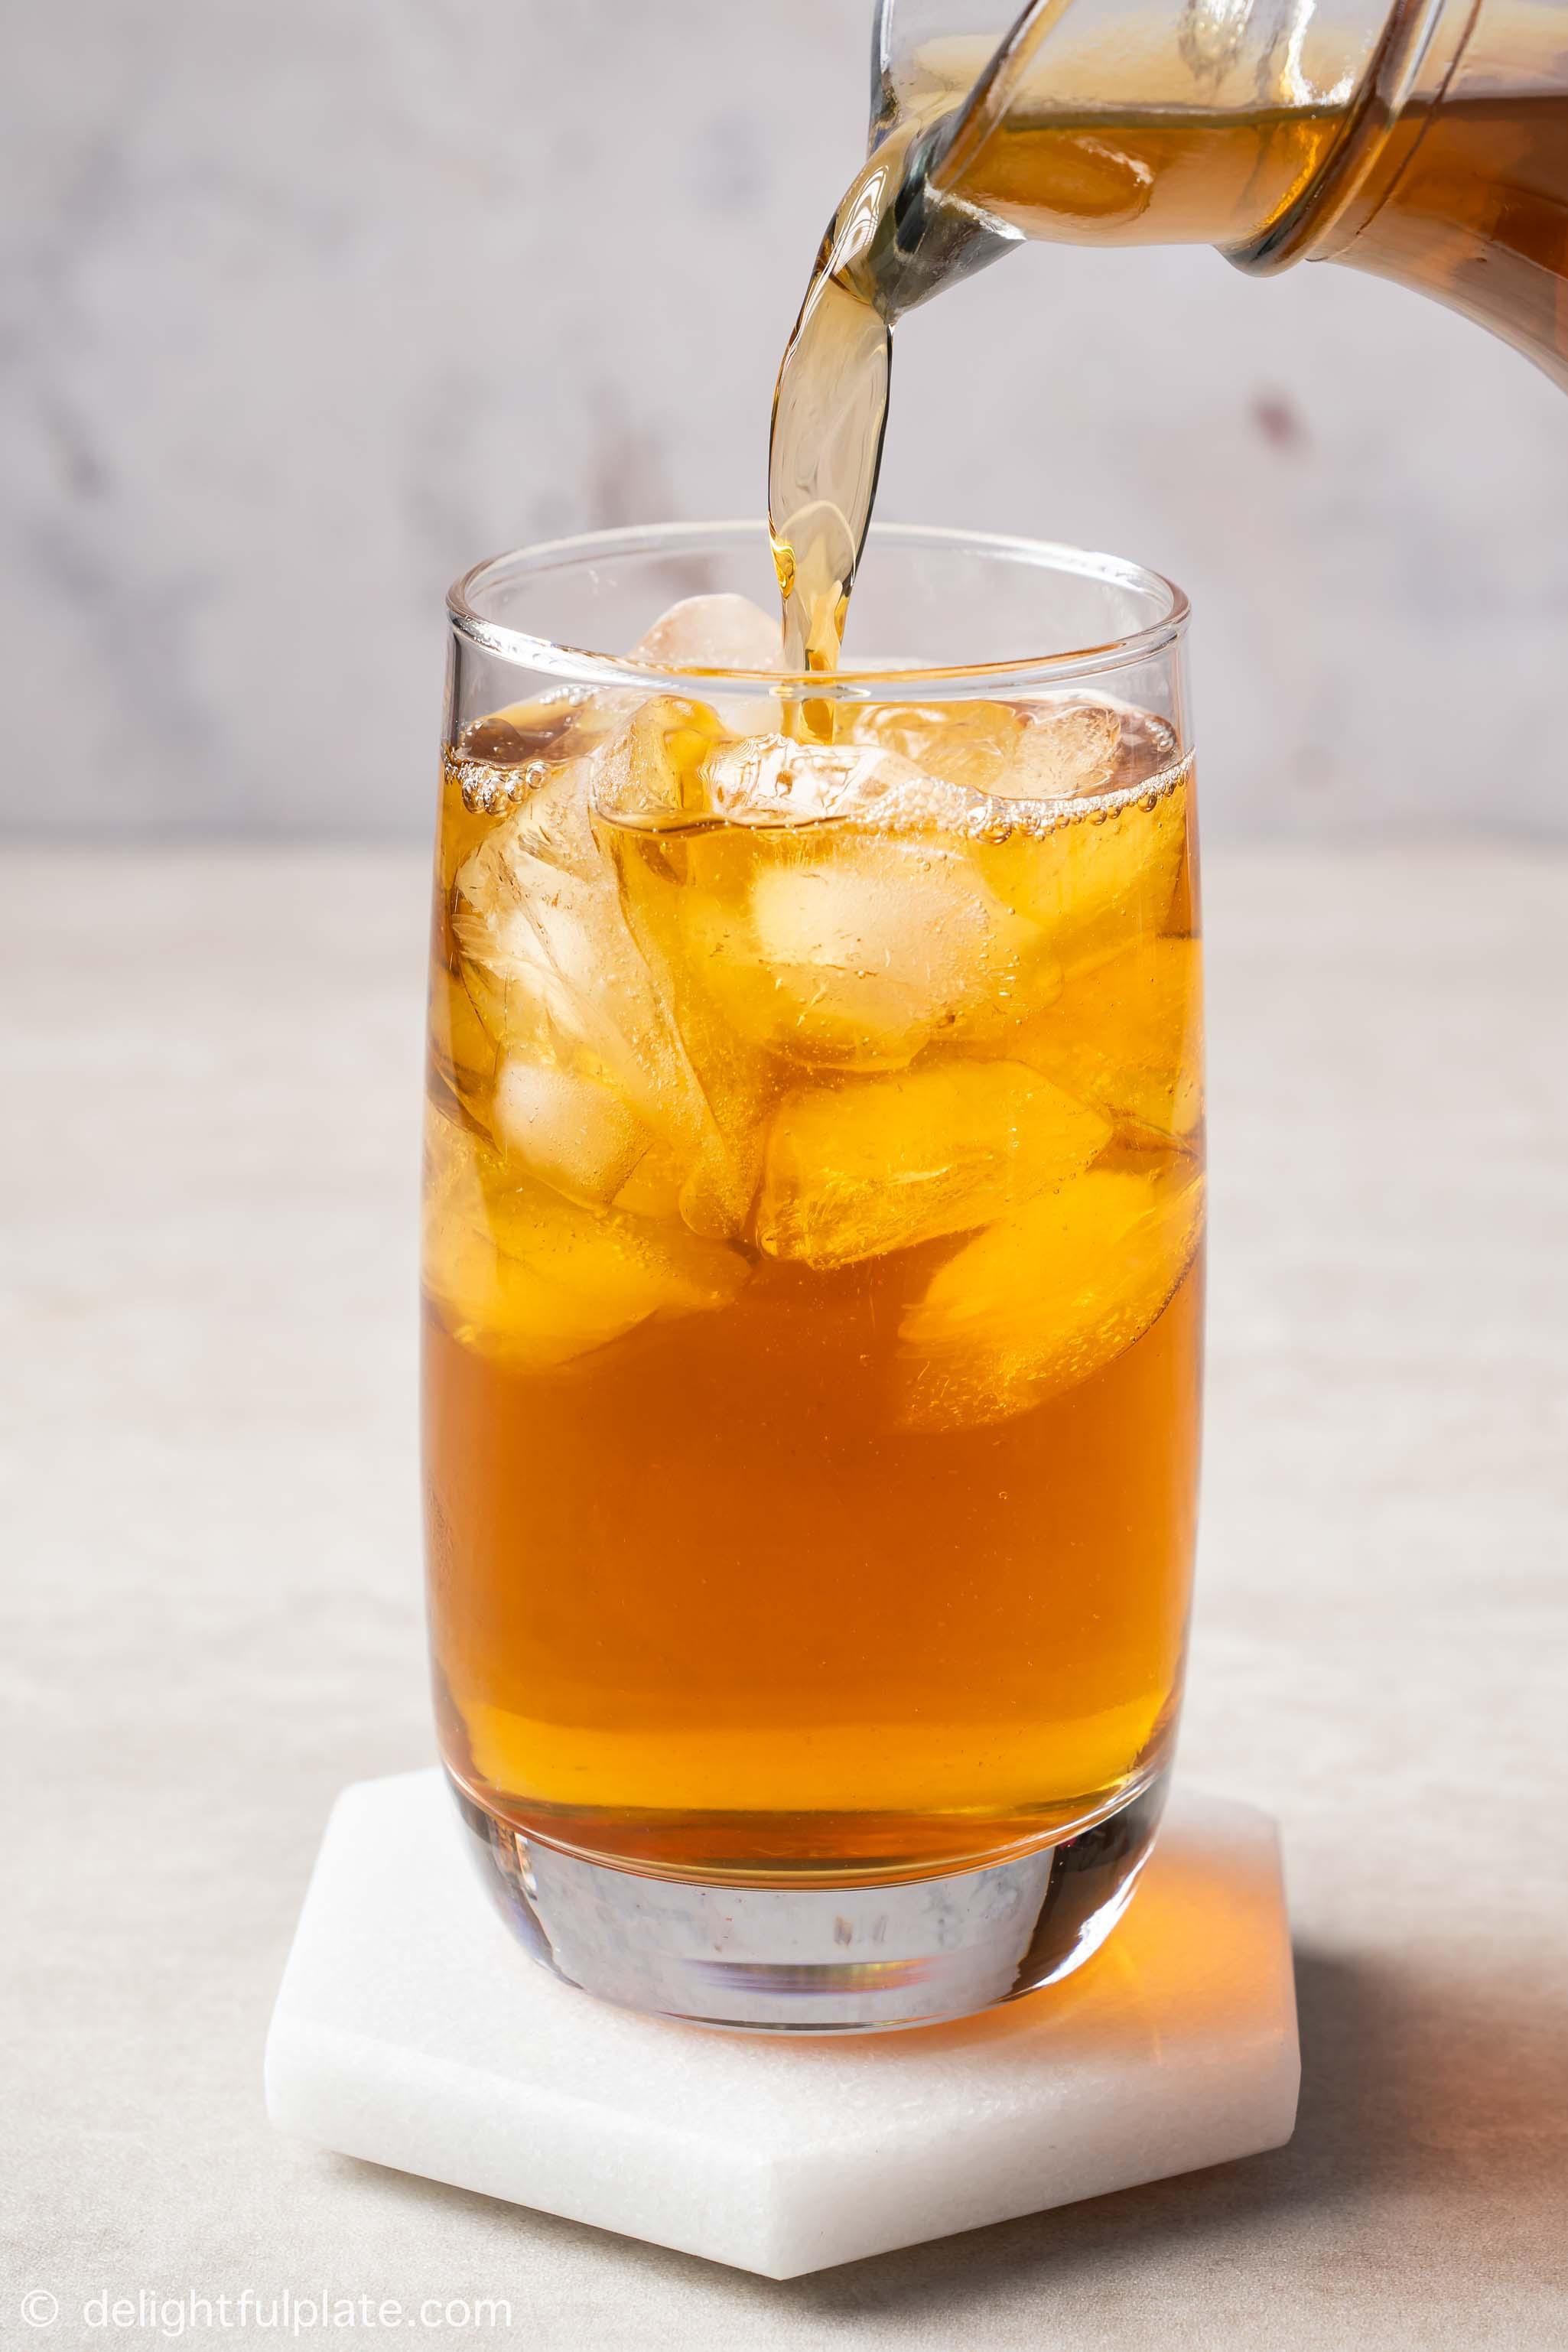 pouring winter melon tea into a glass